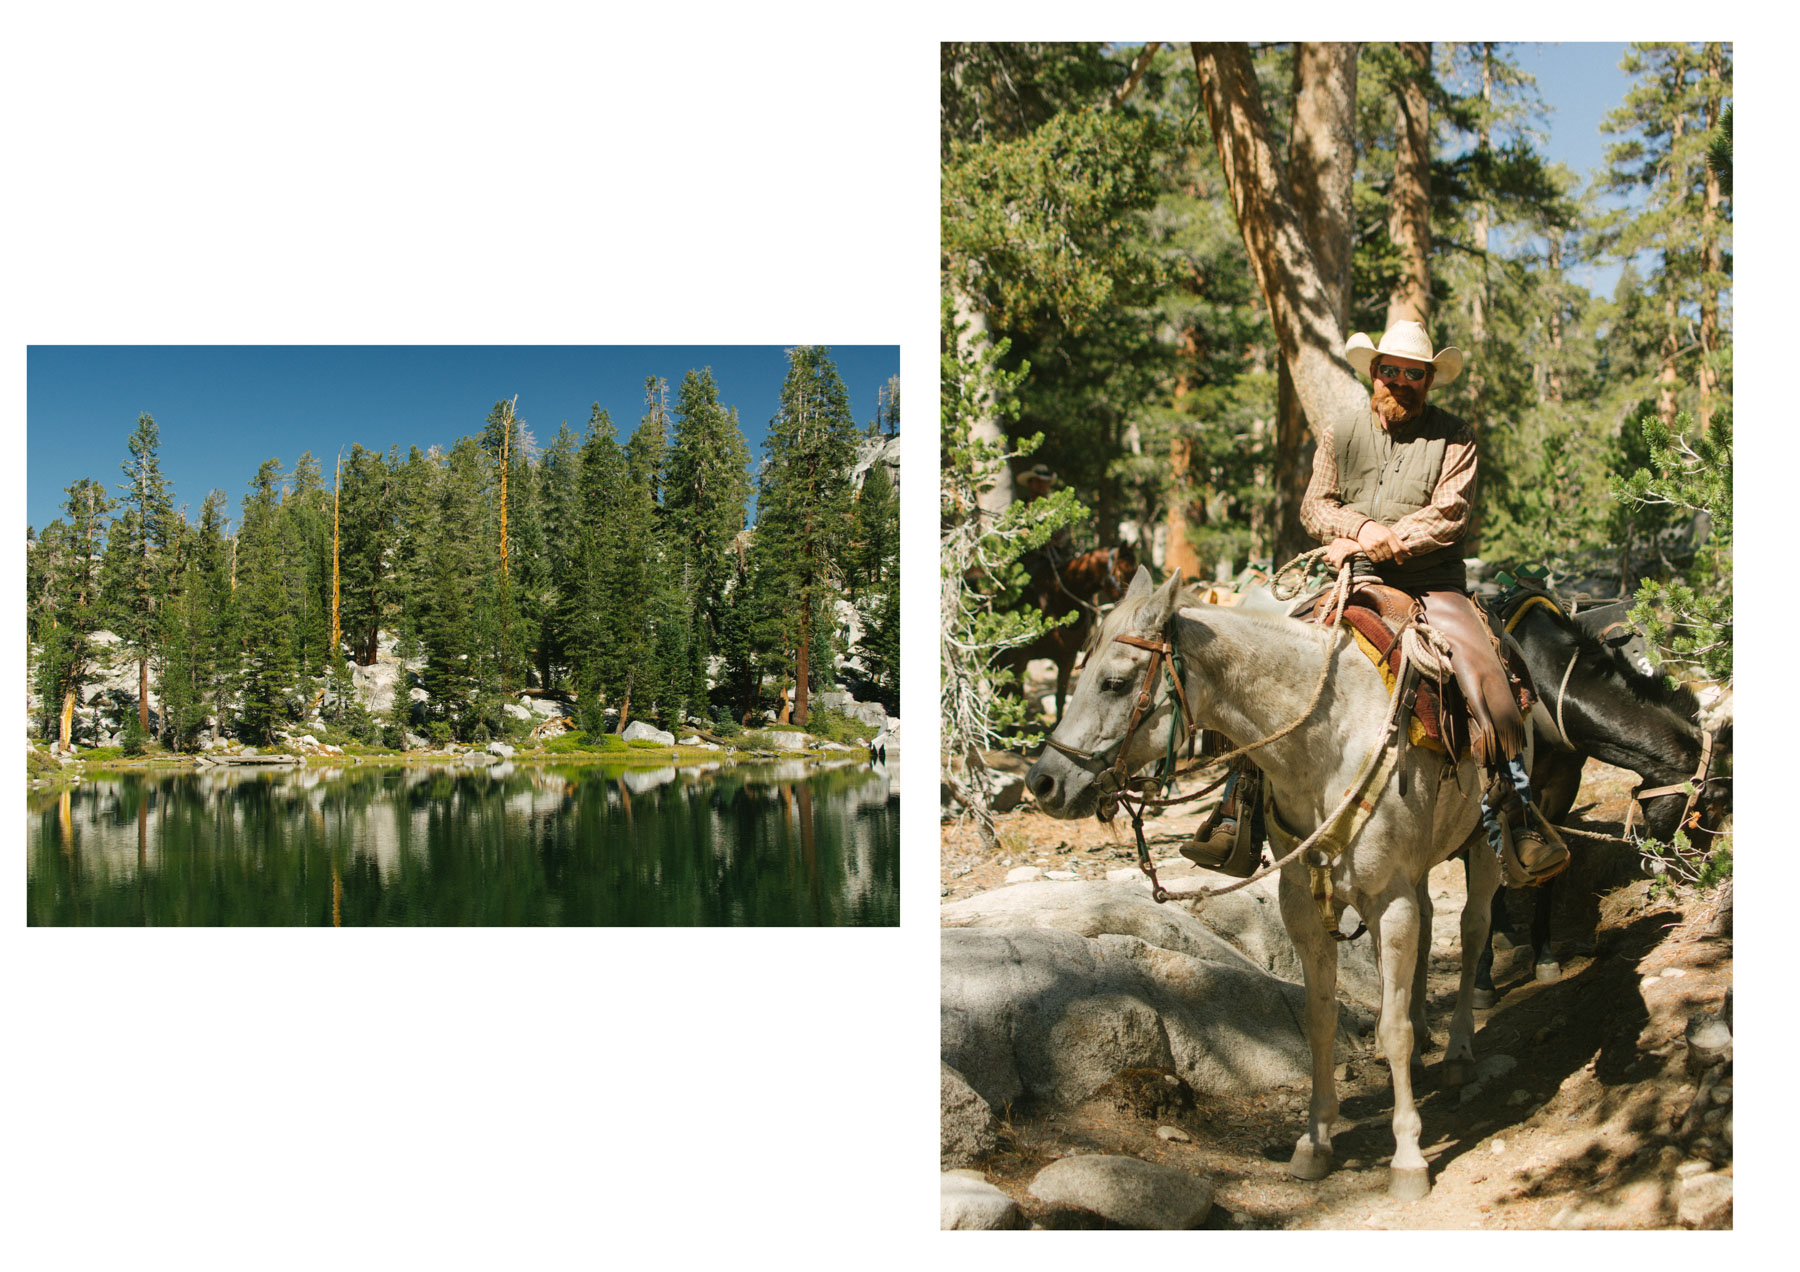 Emerald Lake and Ranger